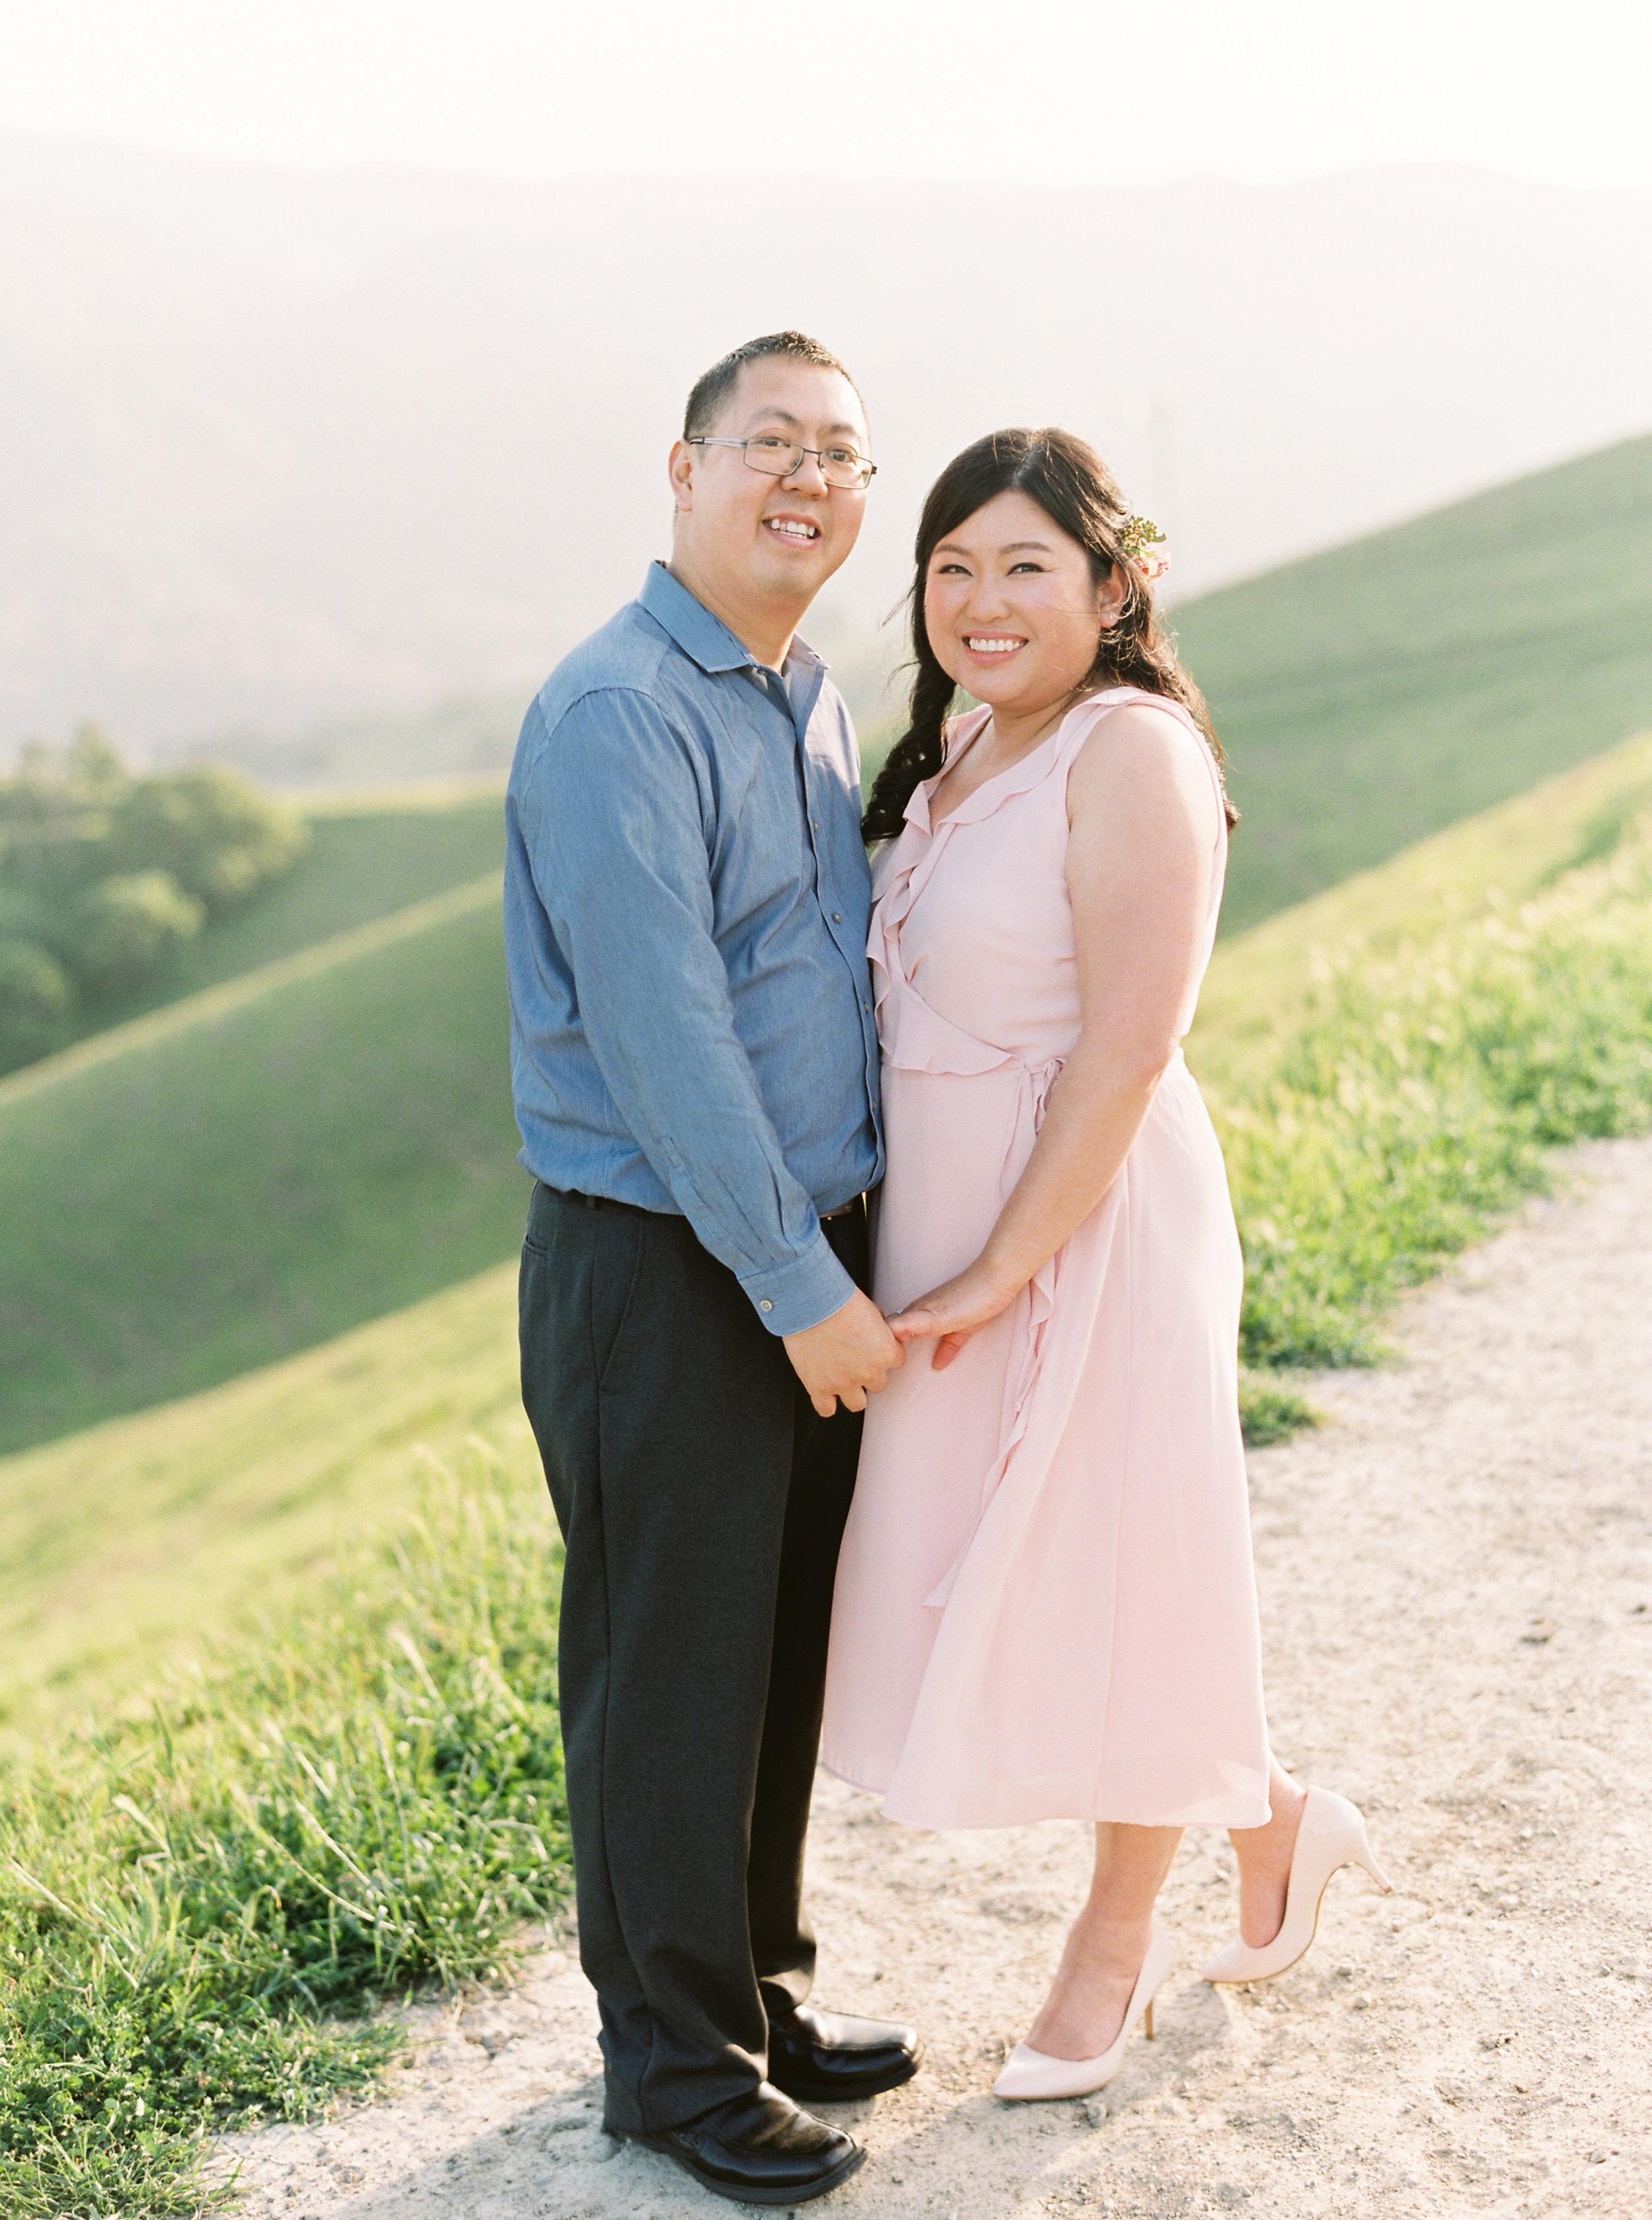 del-valle-livermore-bay-area-wedding-photographer-6.jpg